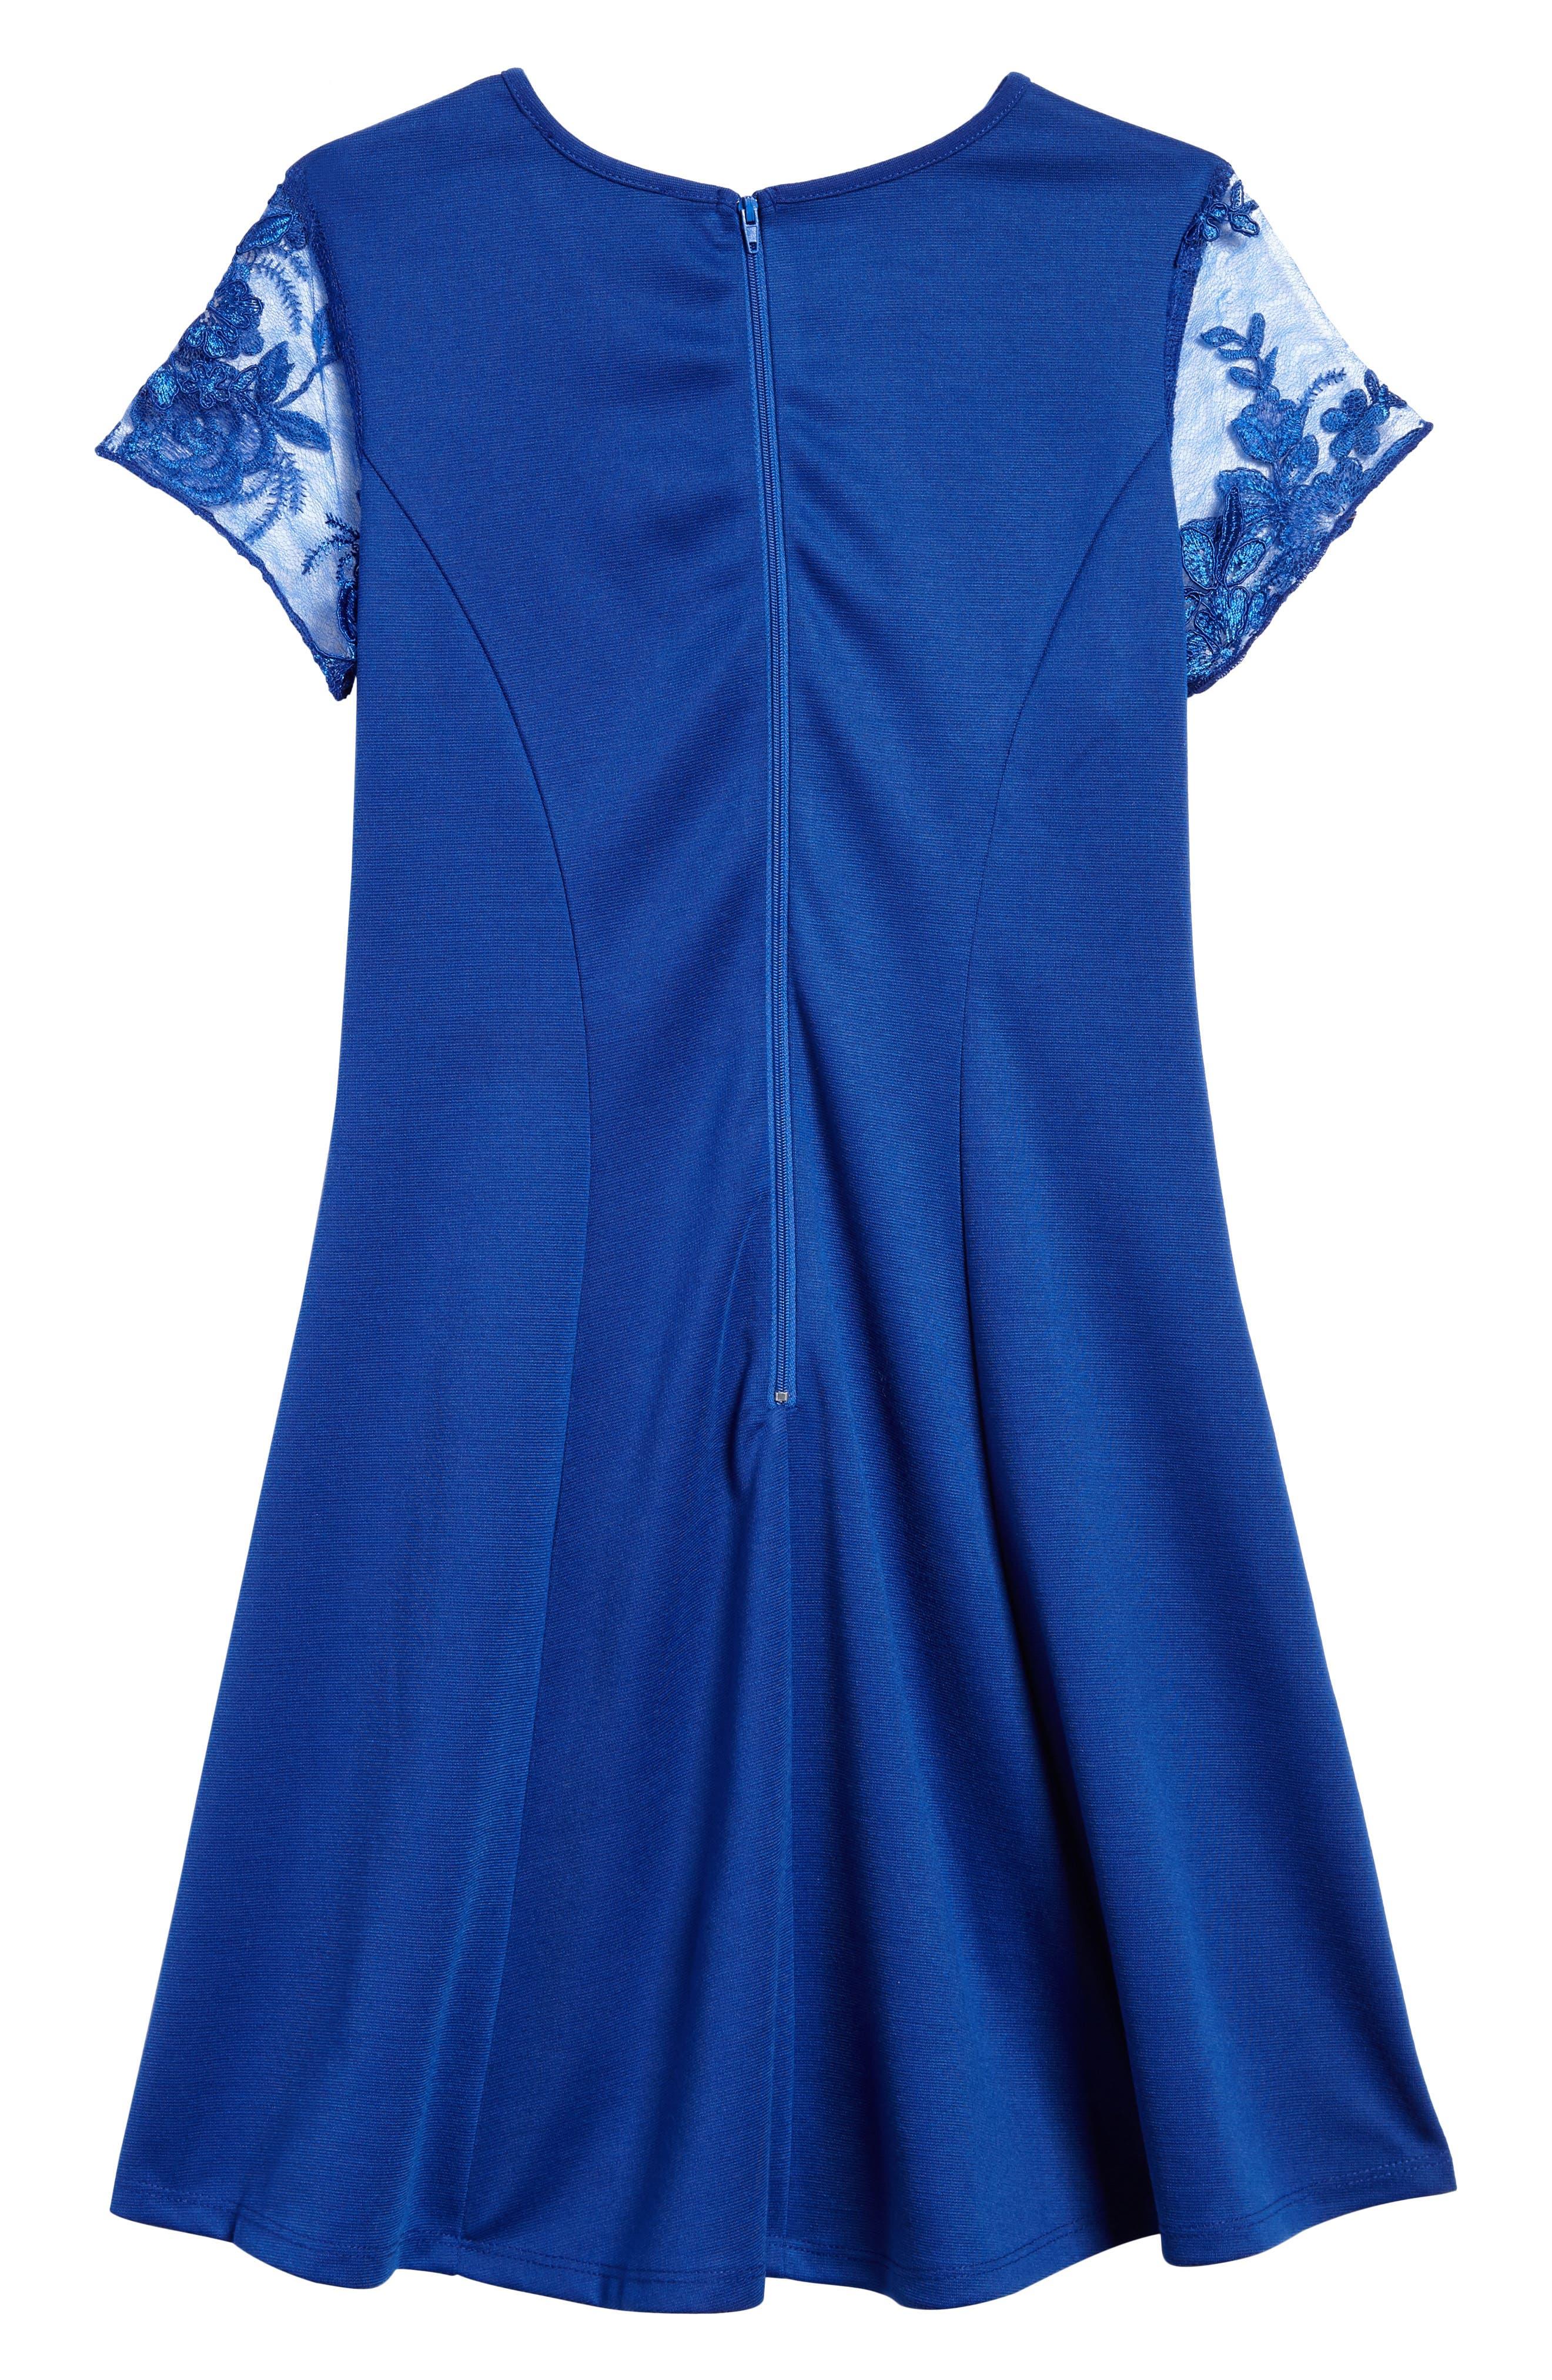 Priscilla Lace Sleeve Dress,                             Alternate thumbnail 2, color,                             Royal